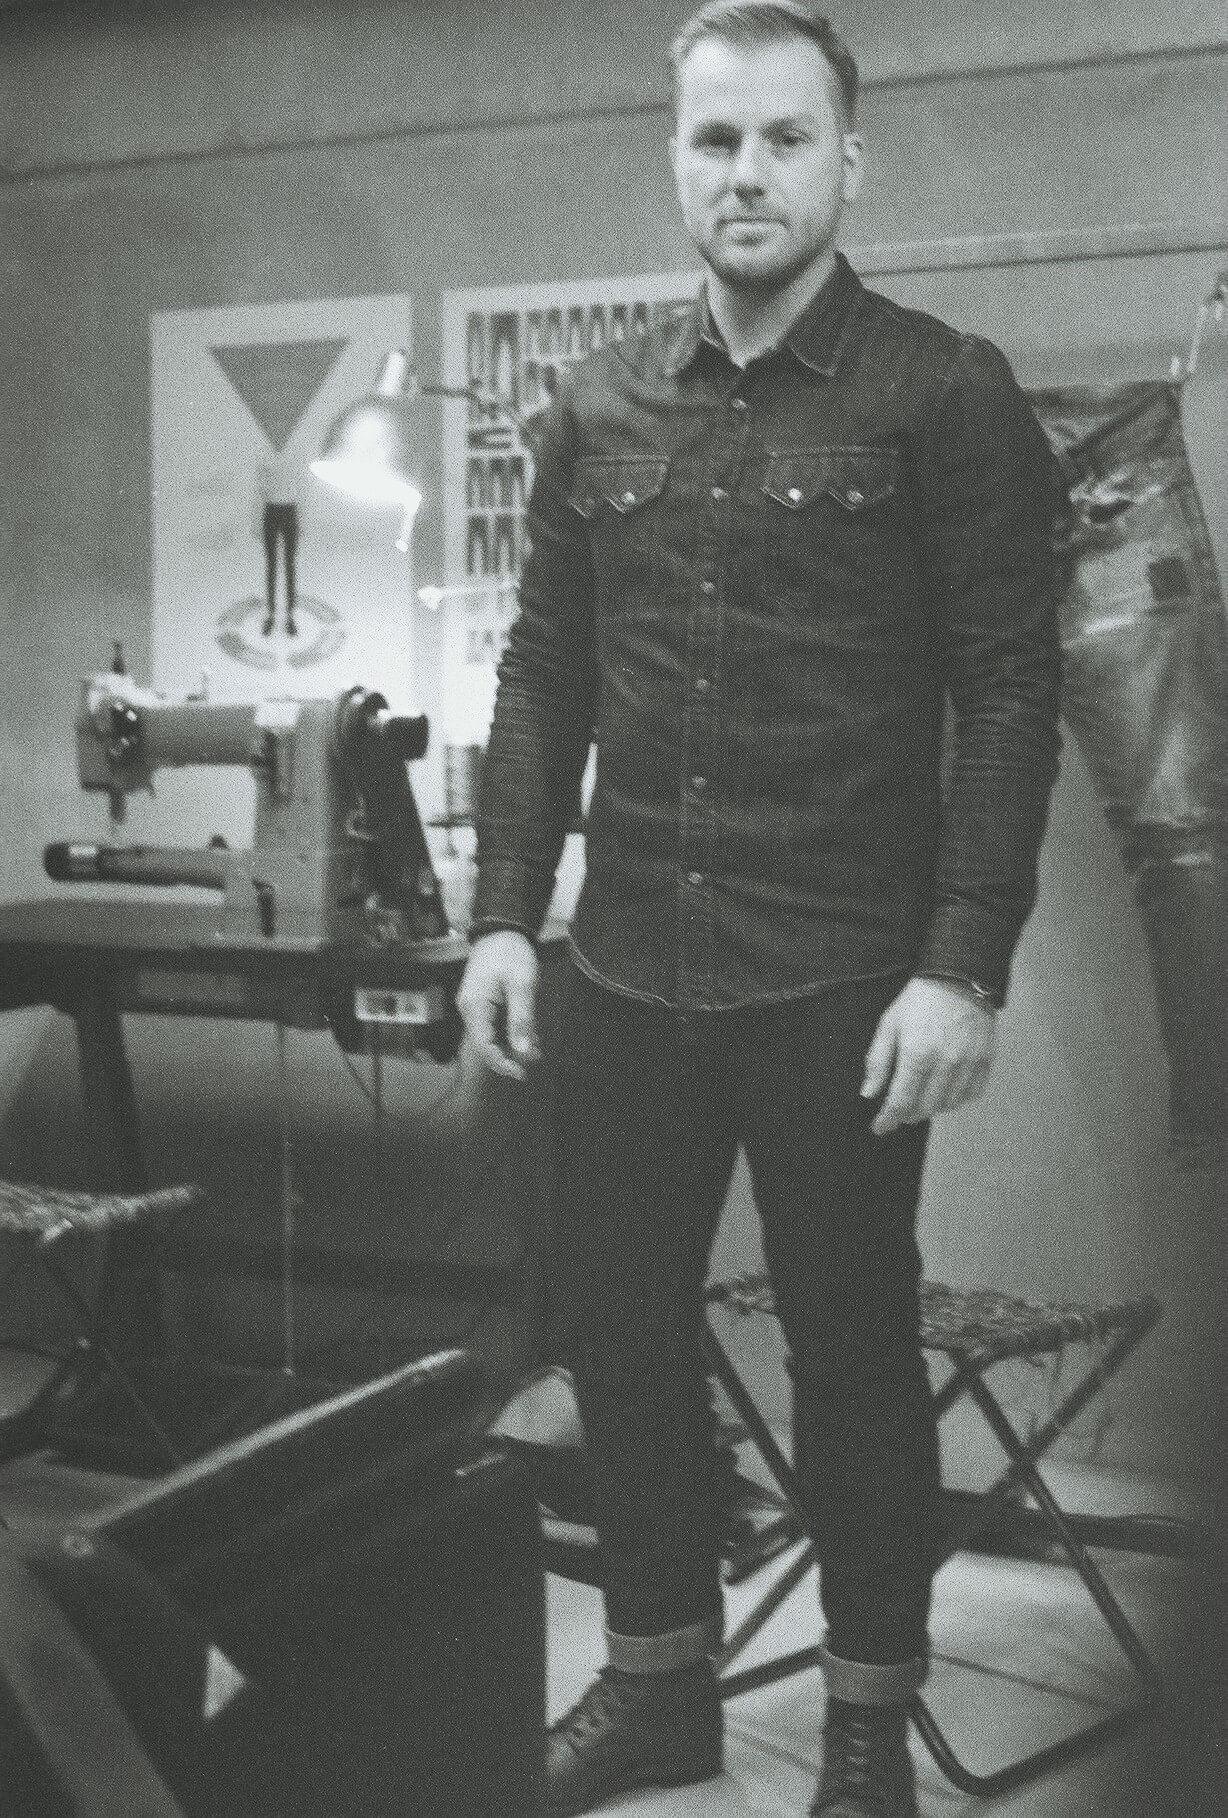 Nudie Jeans X Robin Denim Wear & Tear Contest – Jason